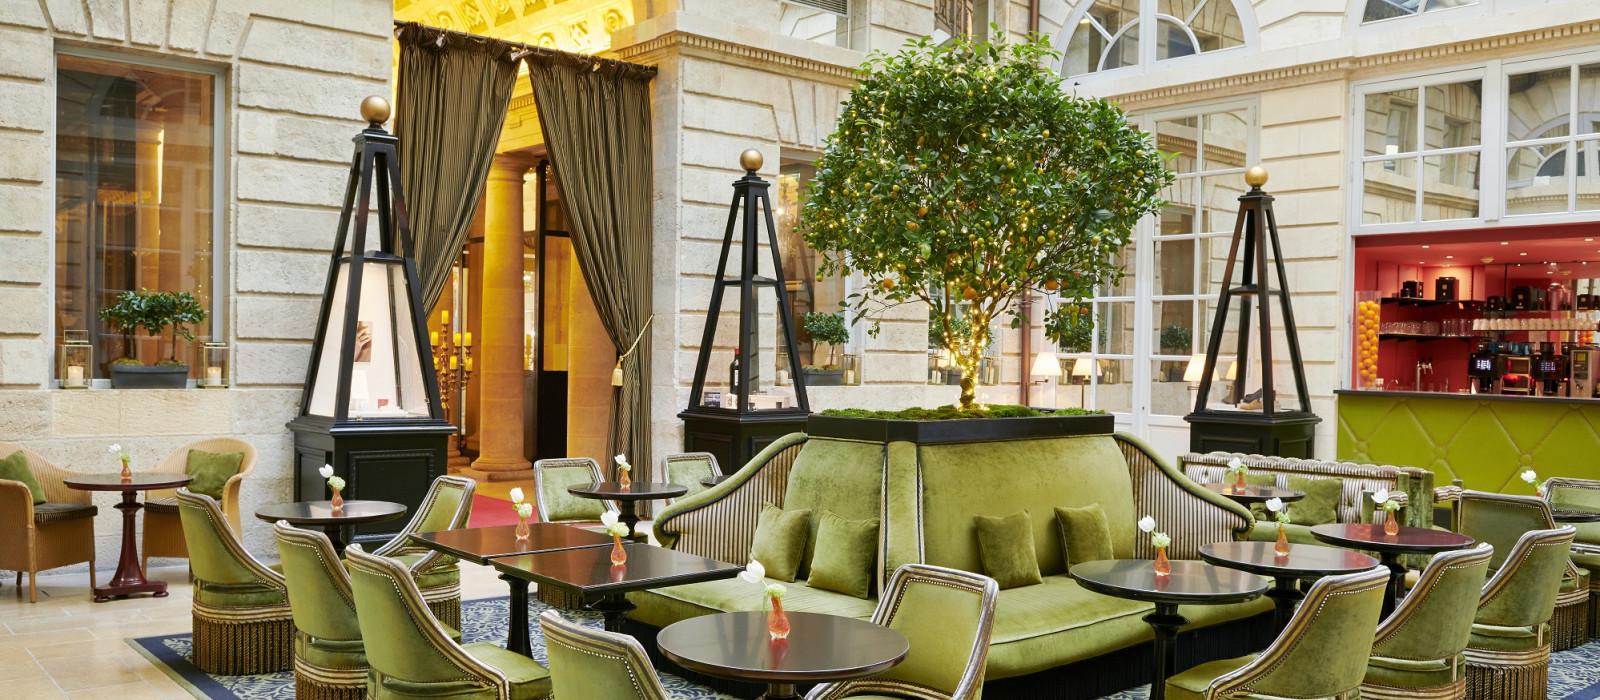 Hotel InterContinental Bordeaux Le Grand  France